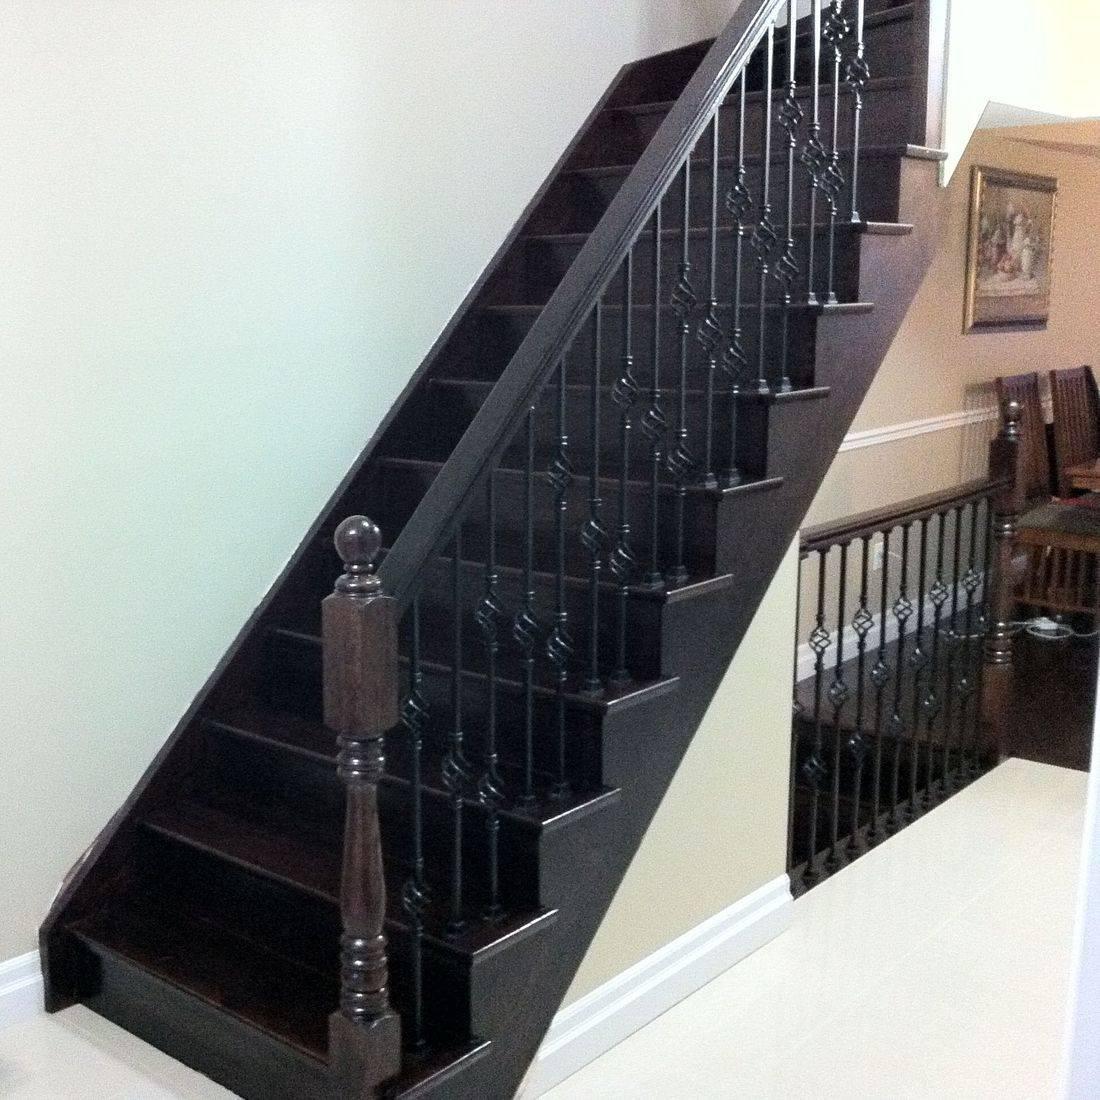 RBI - Staircase